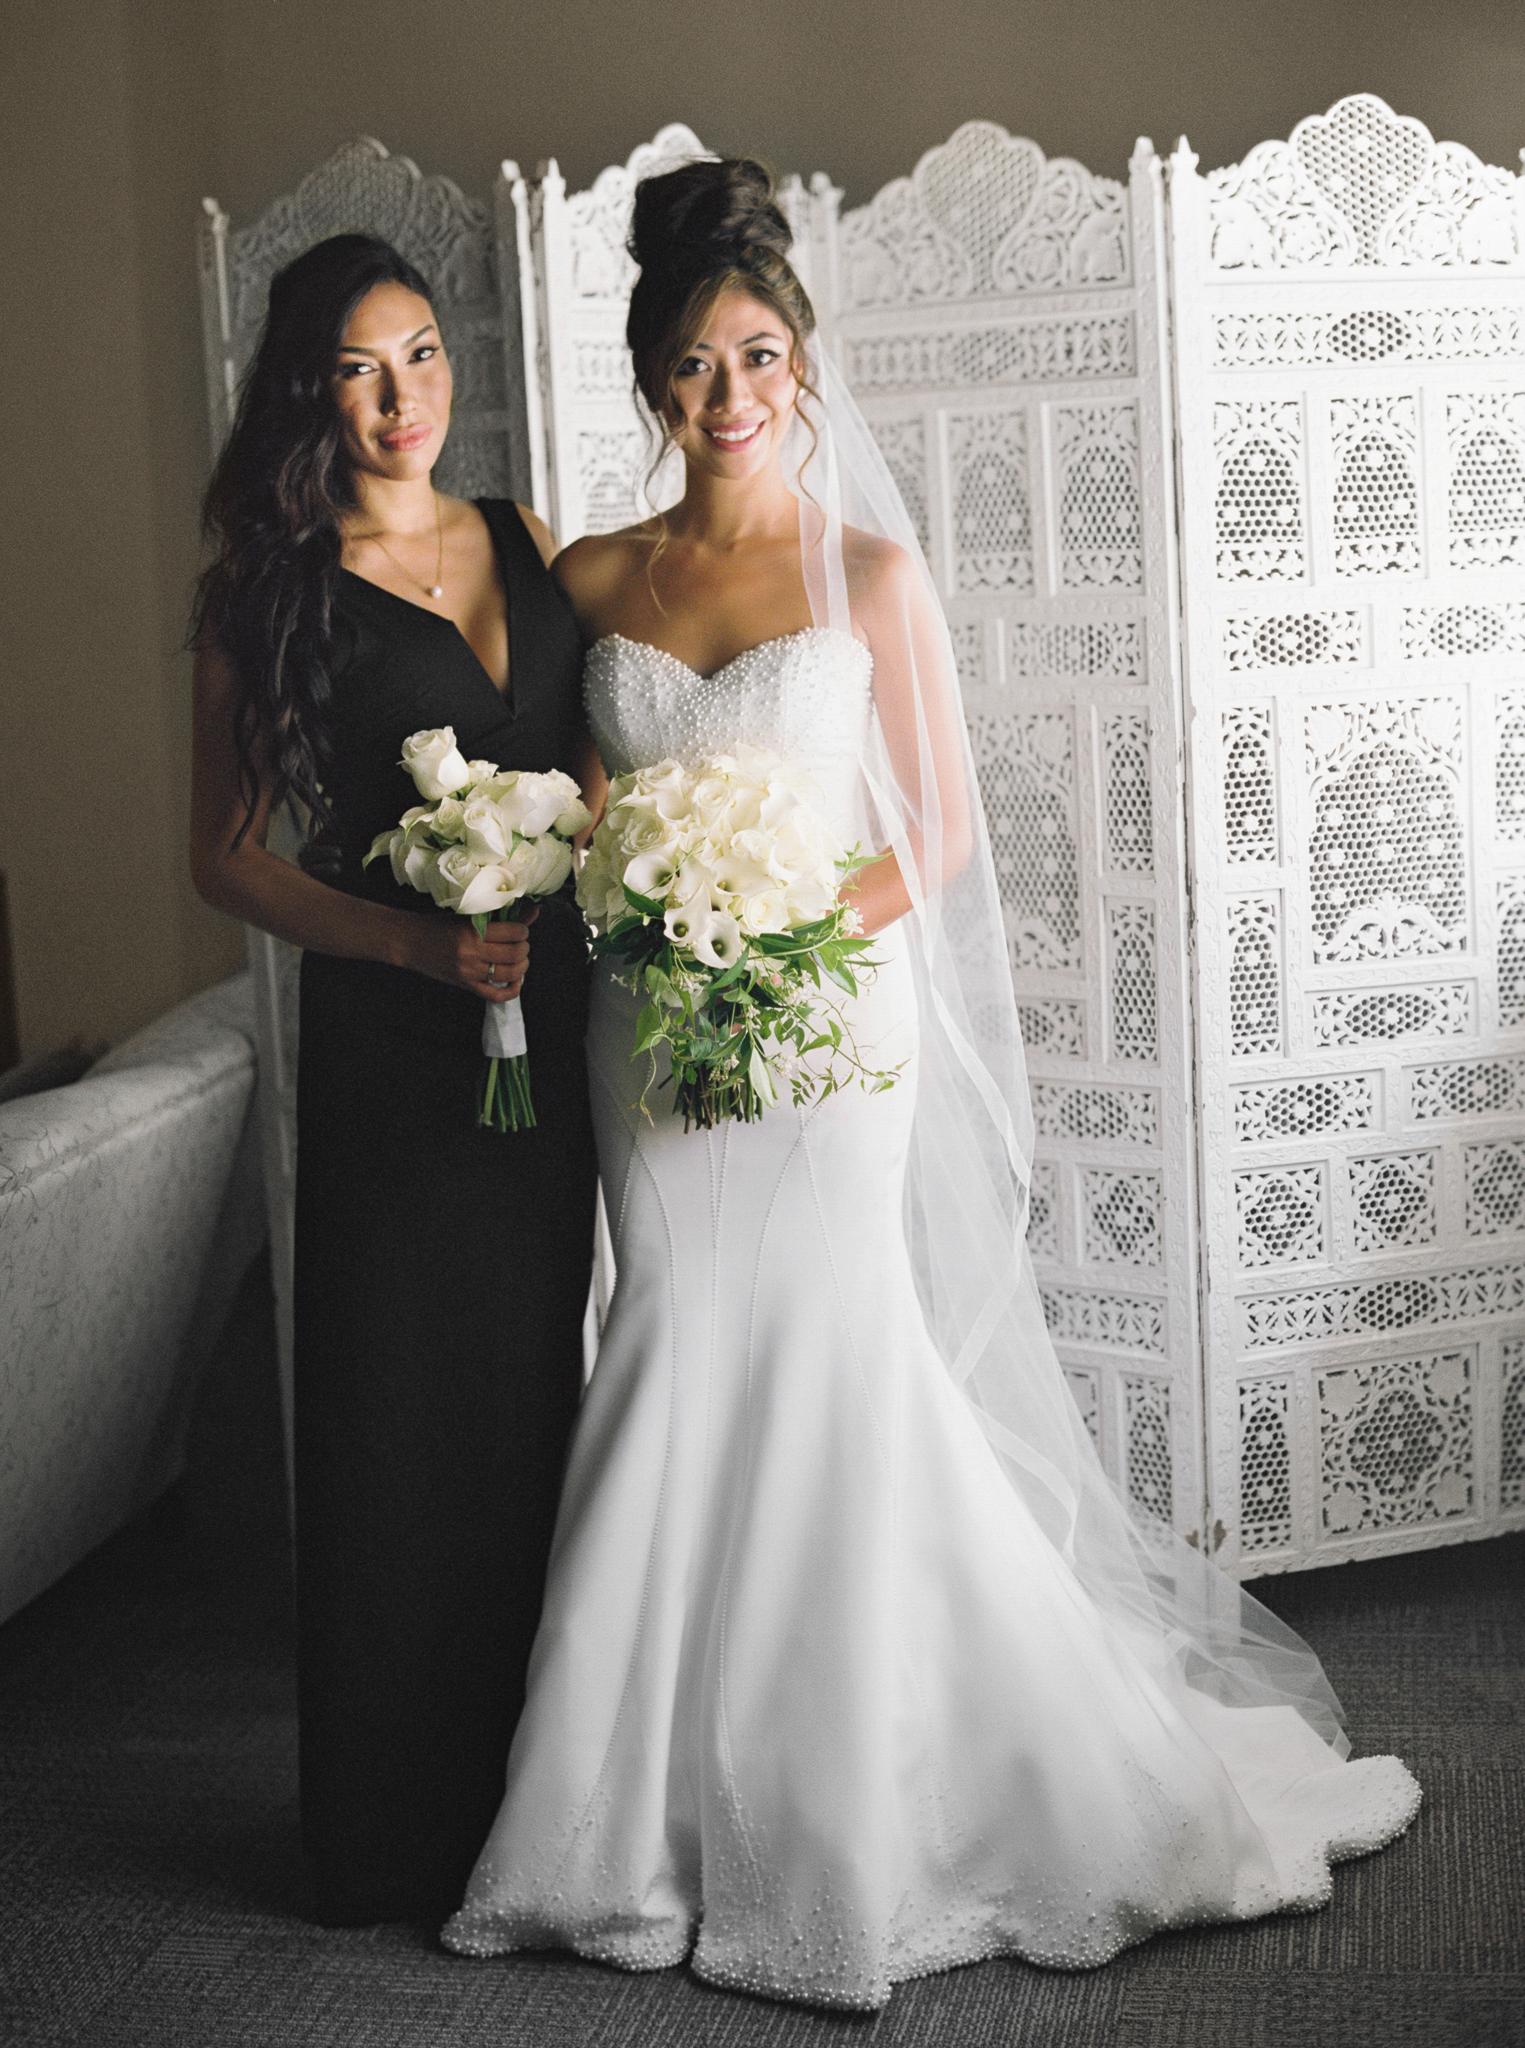 036OutliveCreative_Travel_Photographer_Videographer_Lewis&Clark_Oregon_Elegant_BlackTie_Destination_Wedding.jpg